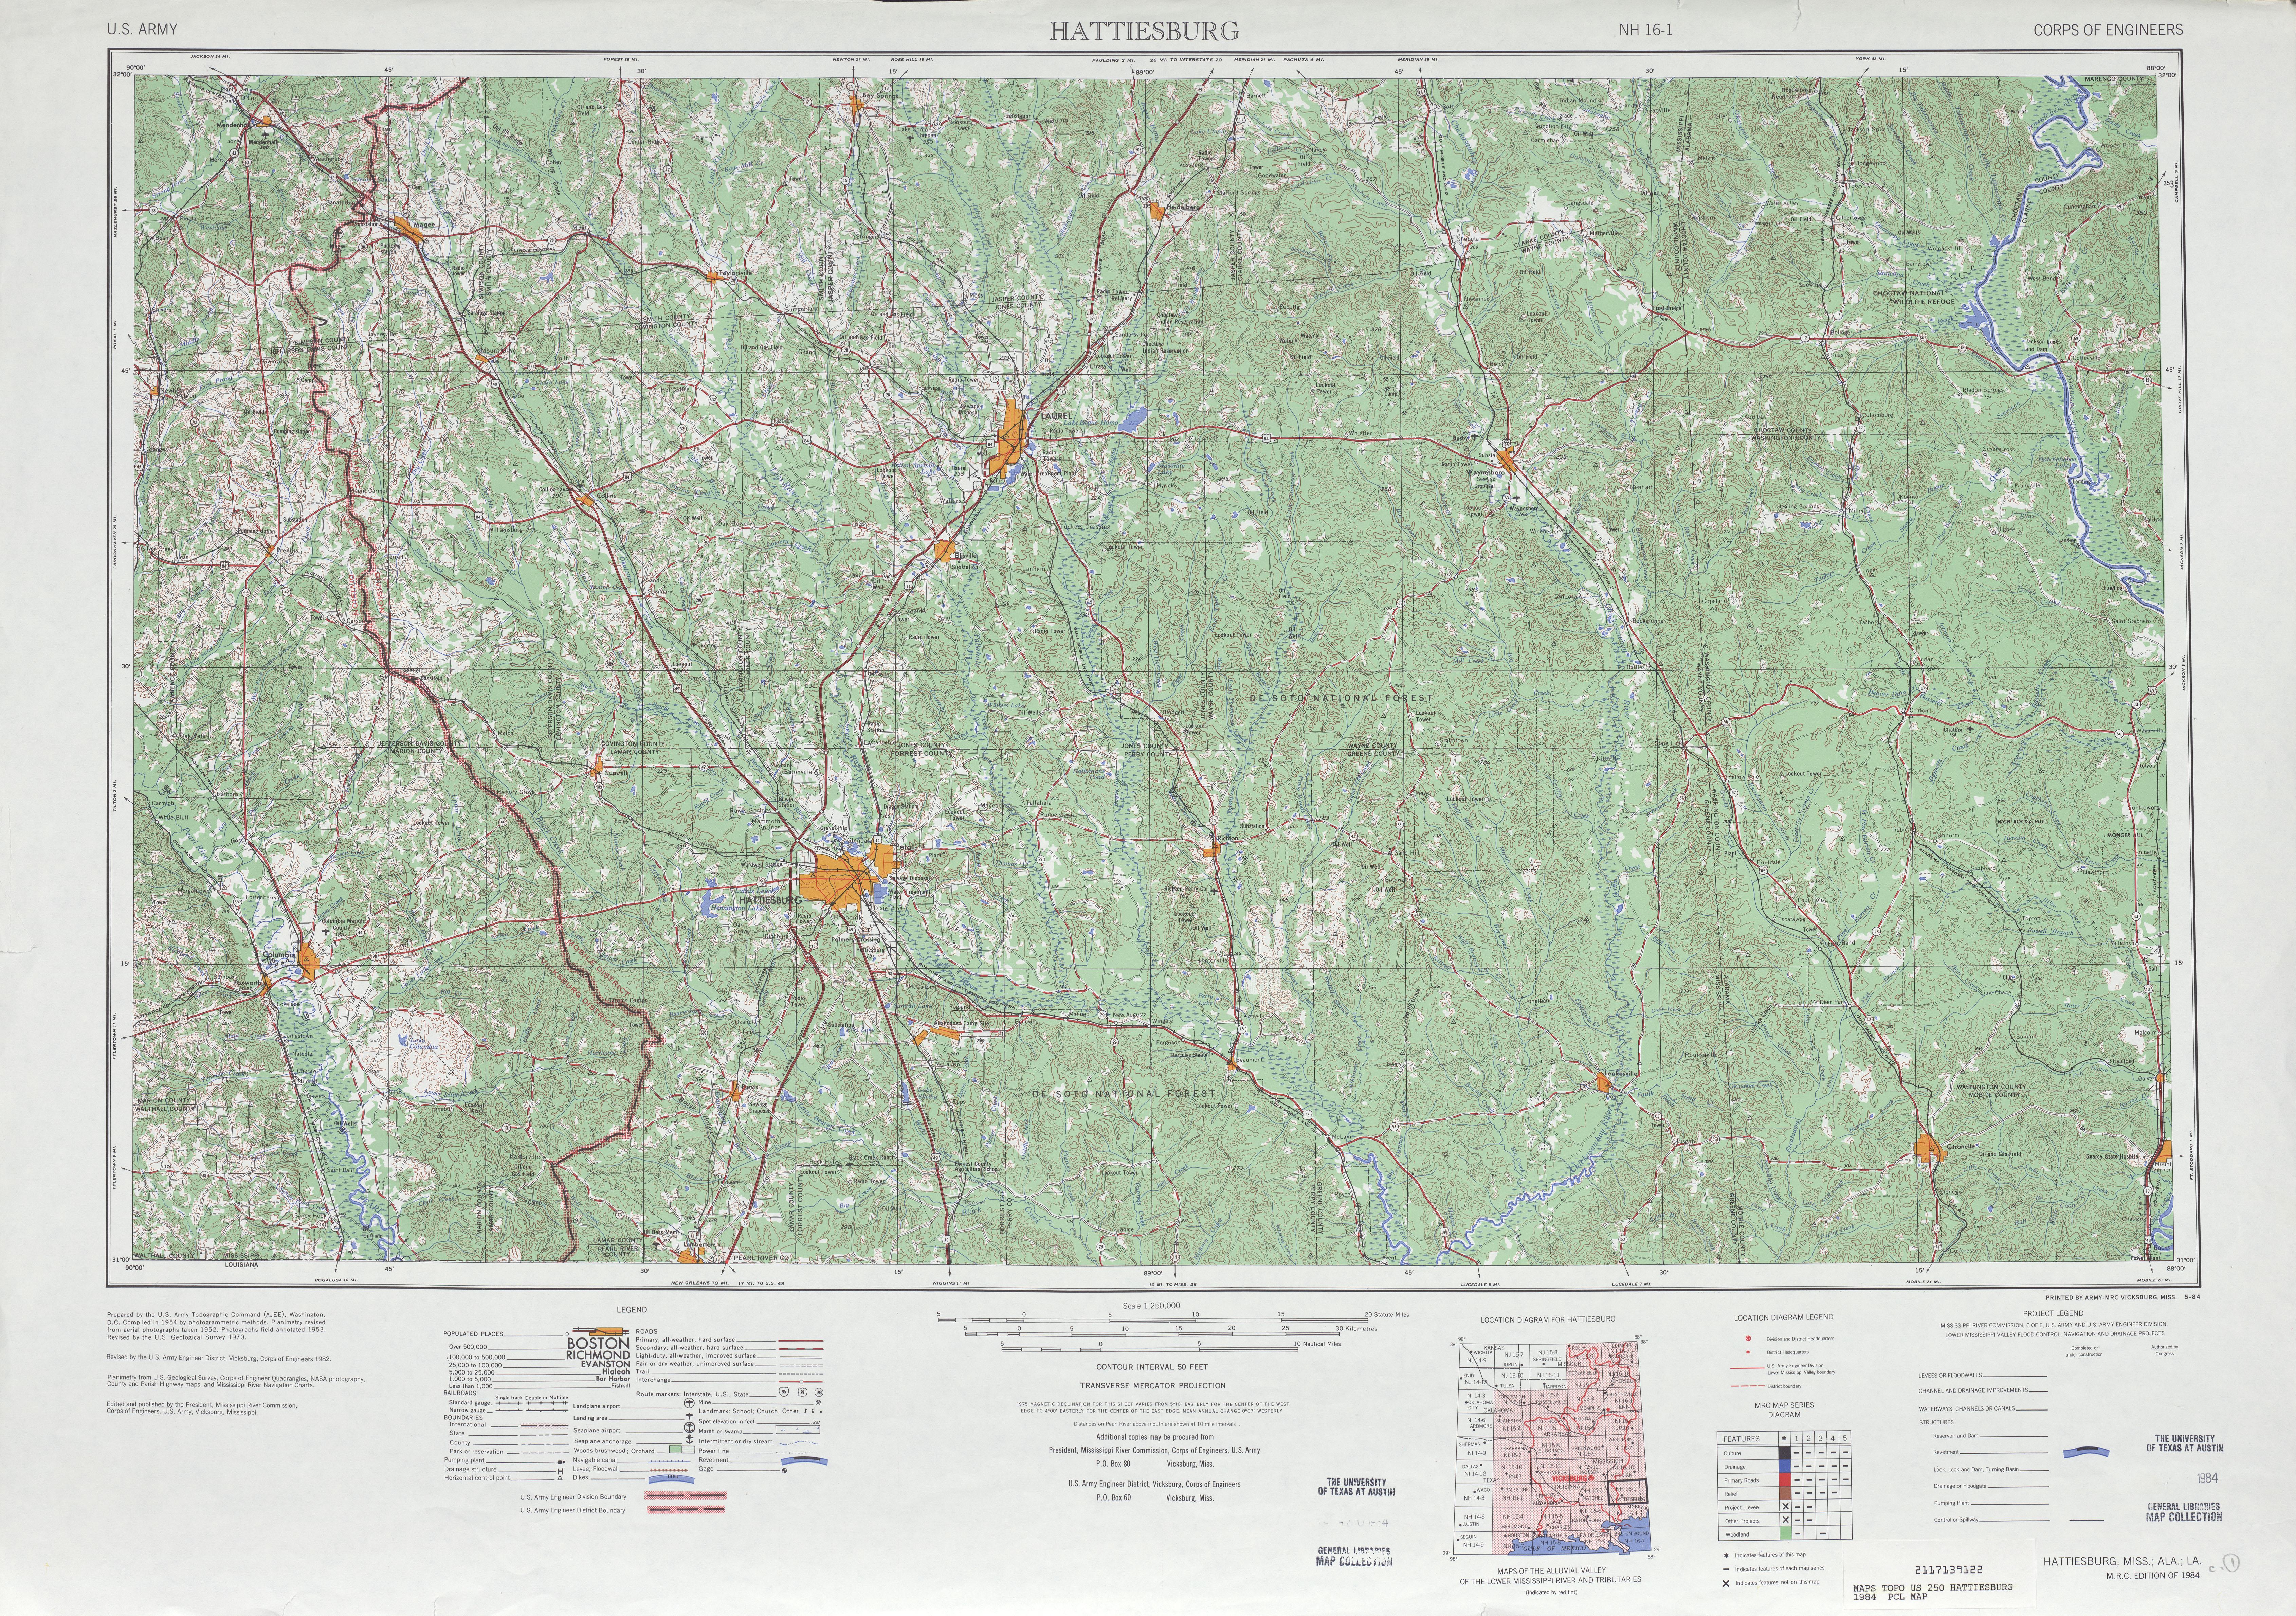 Alabama Louisiana 1 250 000 1984 11 2 Mb